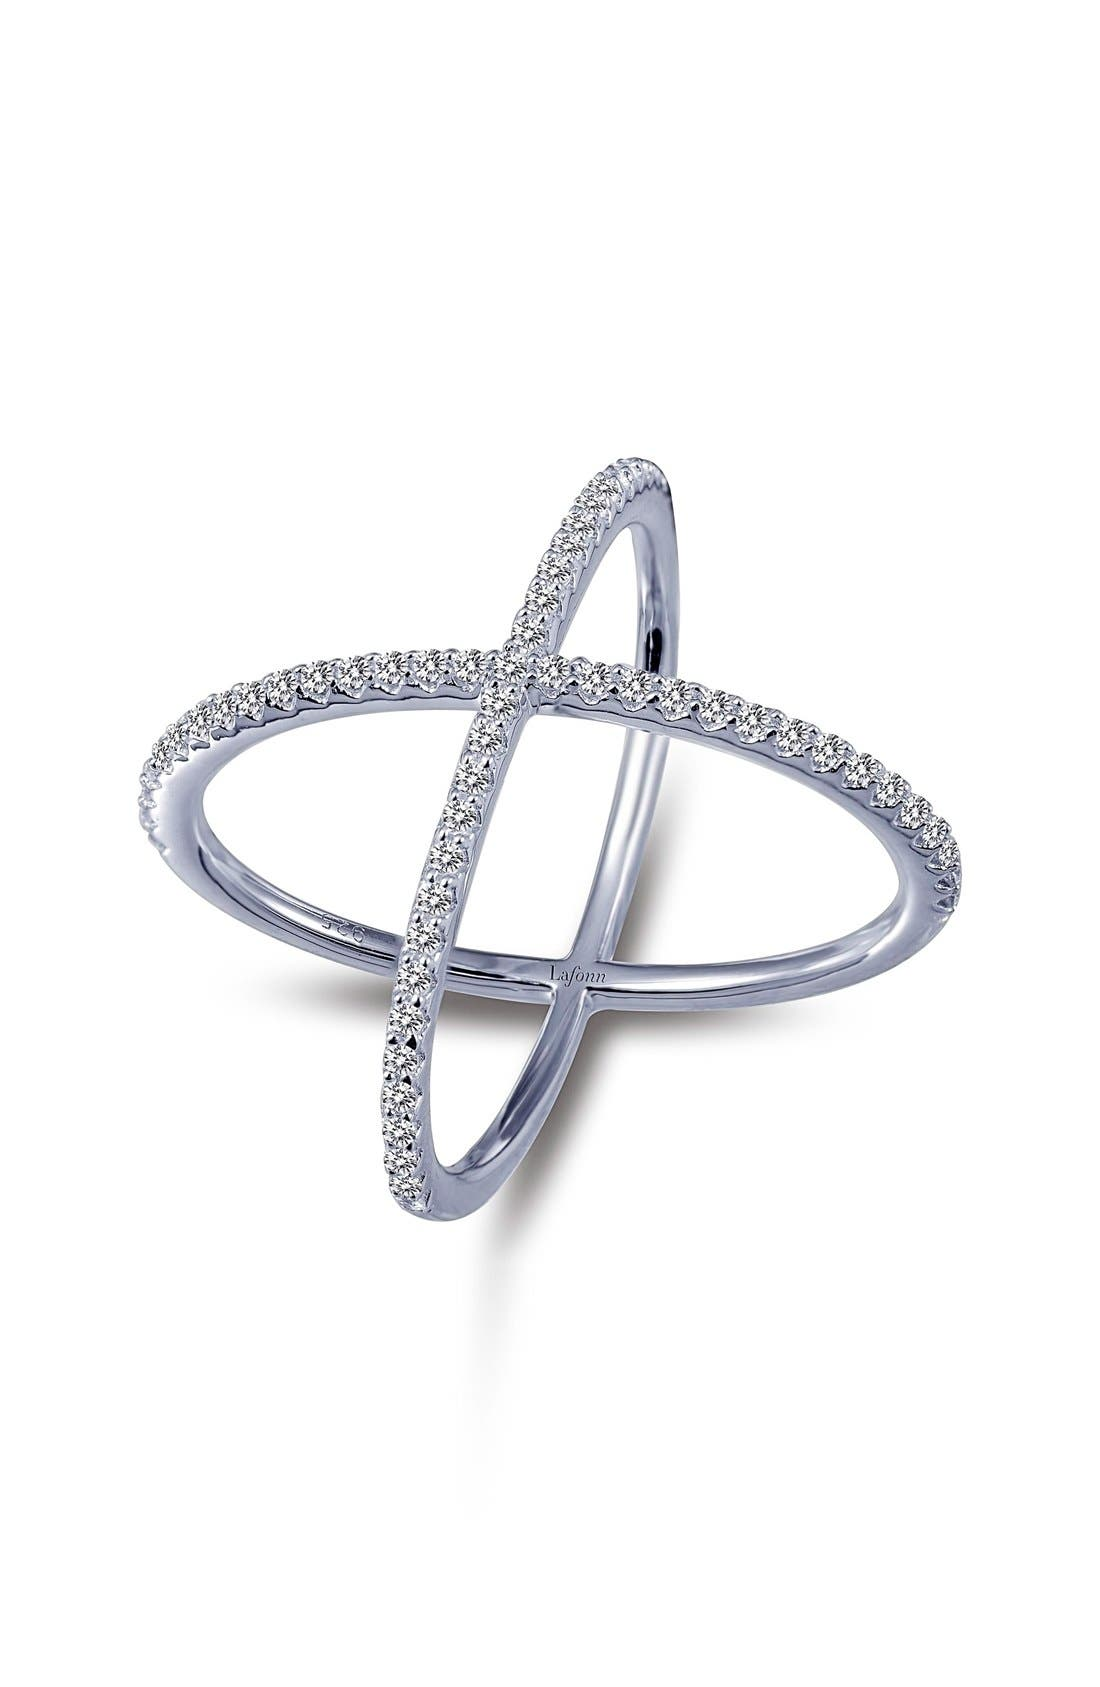 Alternate Image 1 Selected - Lafonn 'Lassaire' Openwork Ring